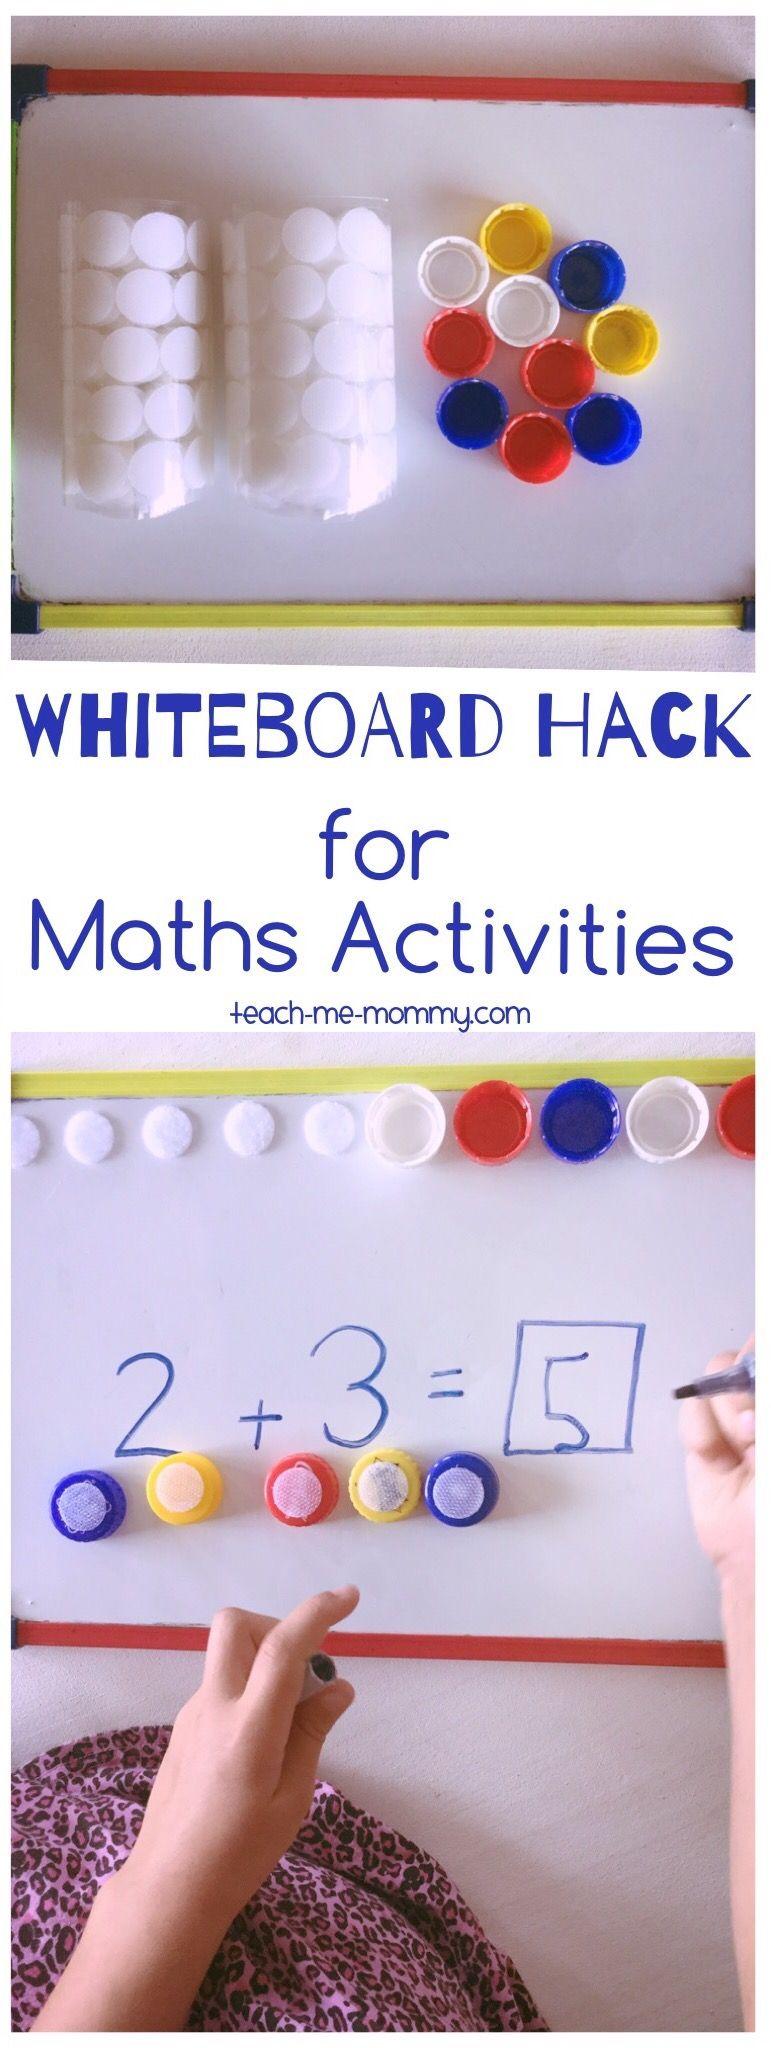 Whiteboard Hack for Maths Activities Math activities